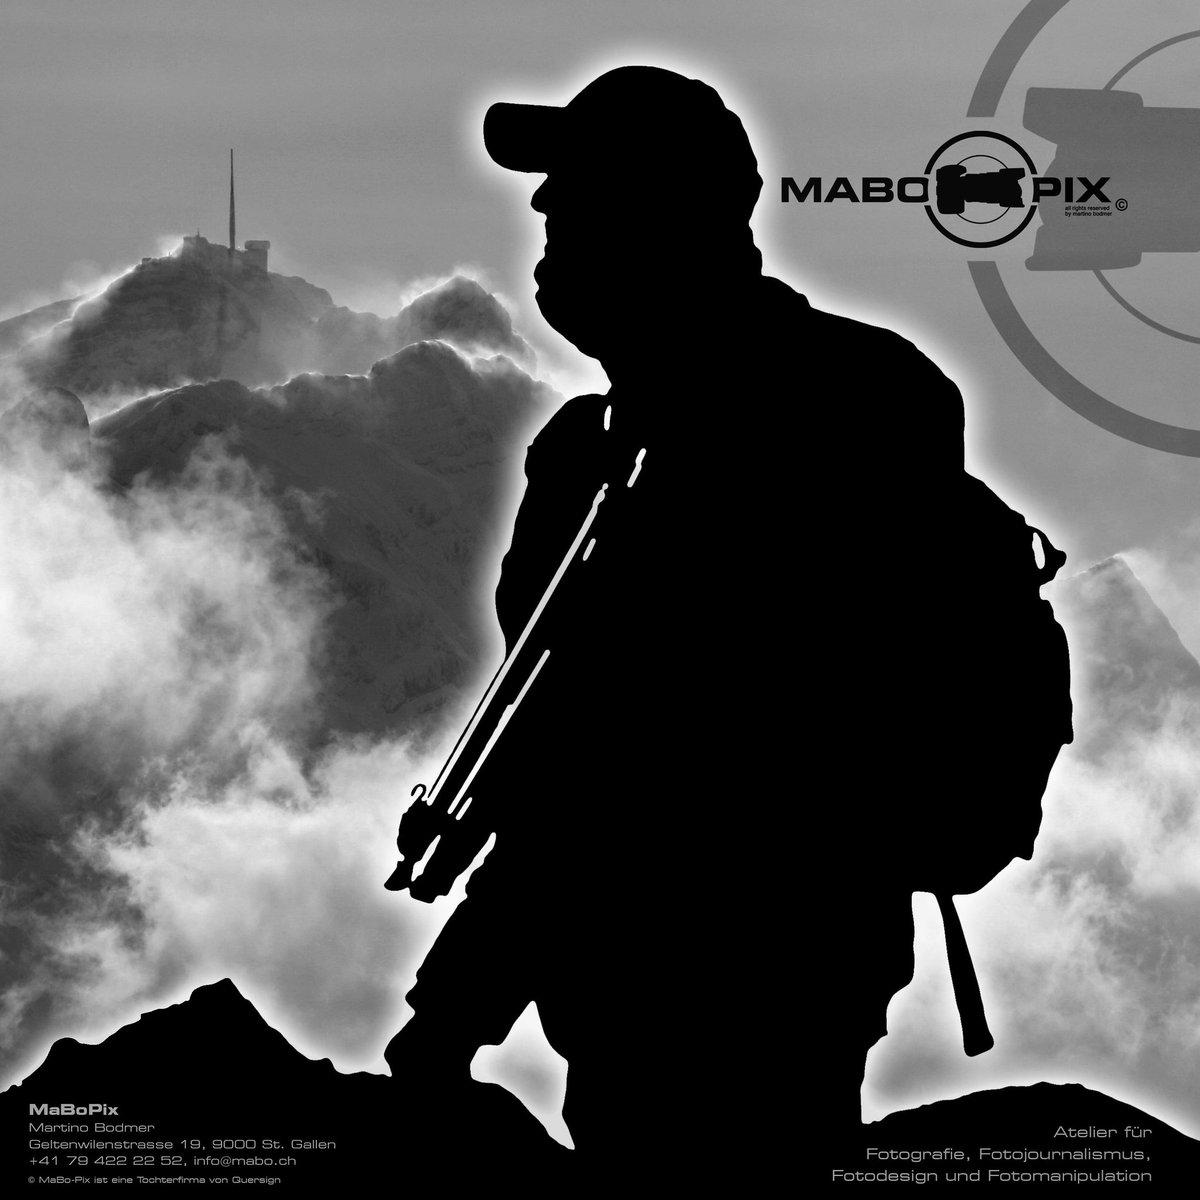 MOMENTE im FOKUS . #mabopix #quersign #mabo #fotomomente #foto #photographer #photograph #fotograf #freelancer #fotografie #fotodesign #fotobearbeitung #fotoentwicklung #prepress #druckvorstufe #photo #photography #swissphotographer #naturfotografie #schweizerfotografen